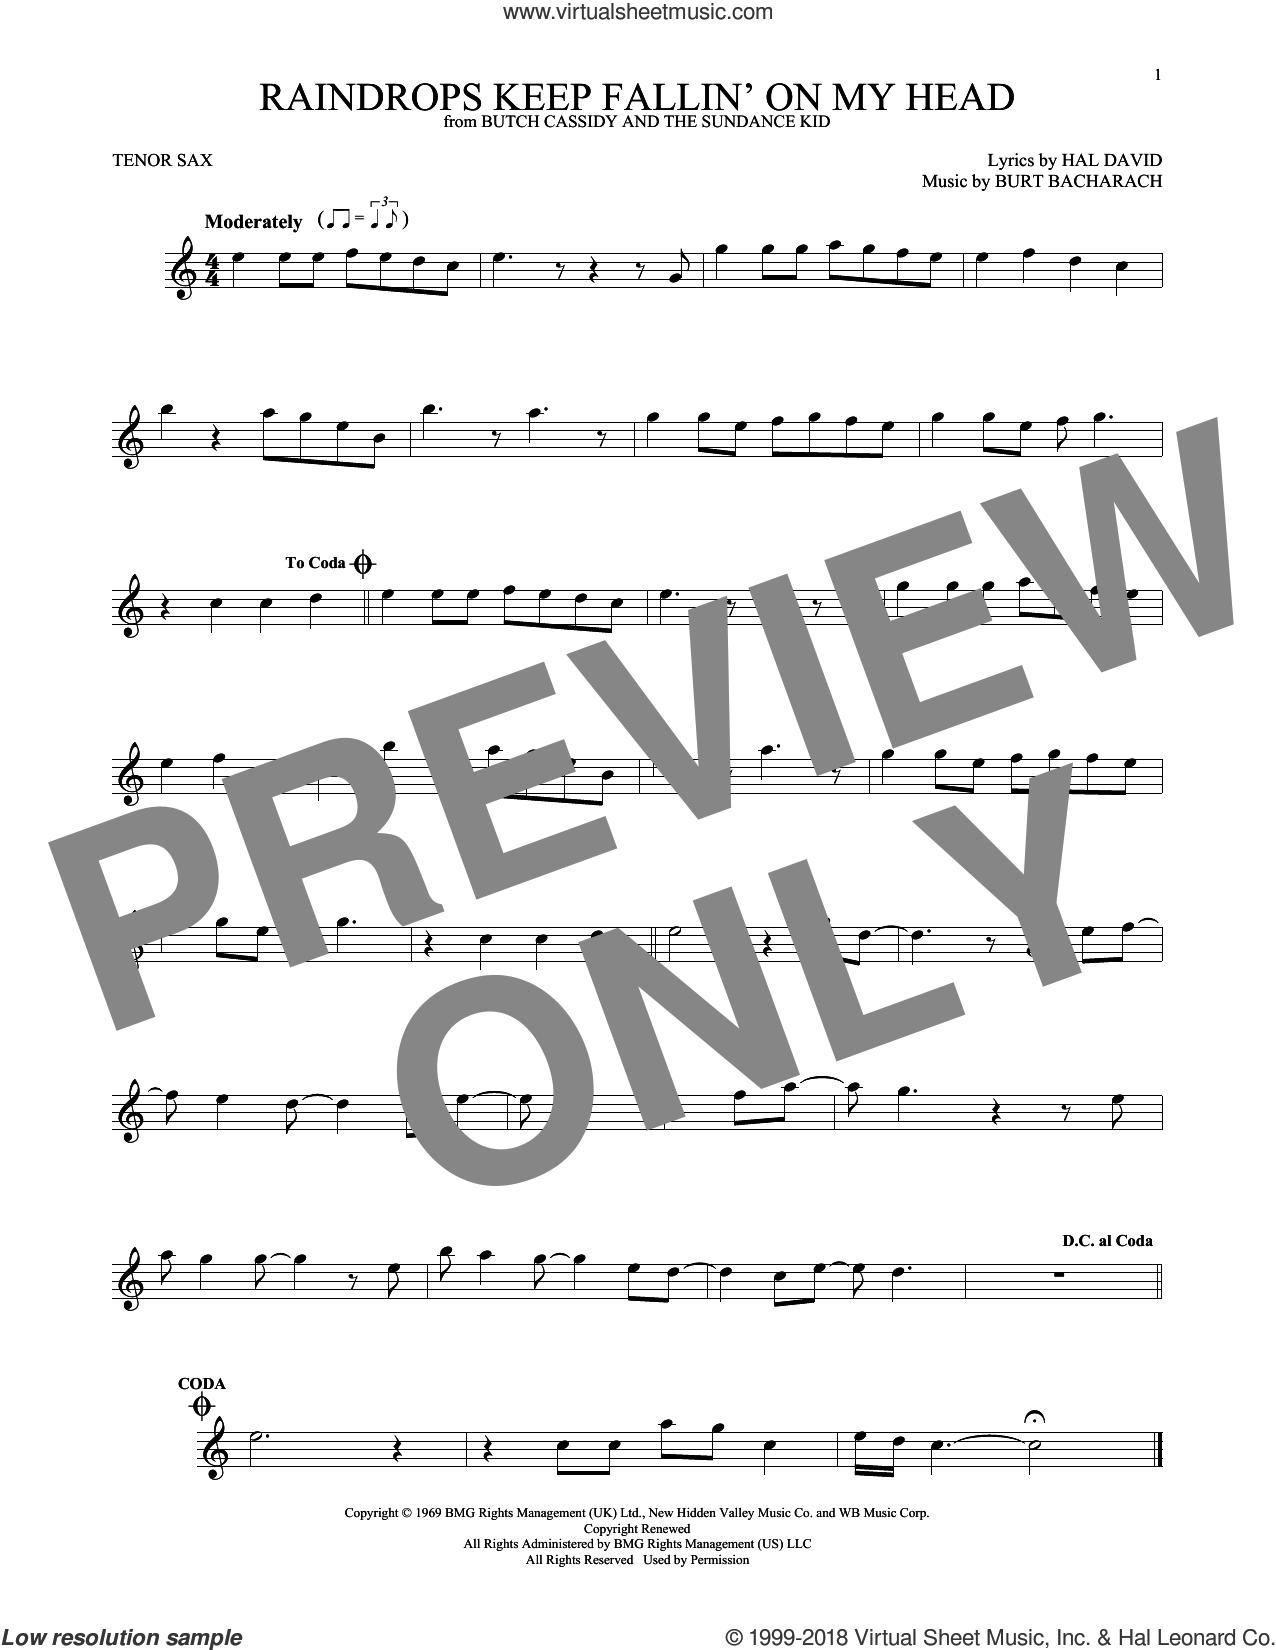 Raindrops Keep Fallin' On My Head sheet music for tenor saxophone solo by Burt Bacharach, B.J. Thomas and Hal David, intermediate skill level